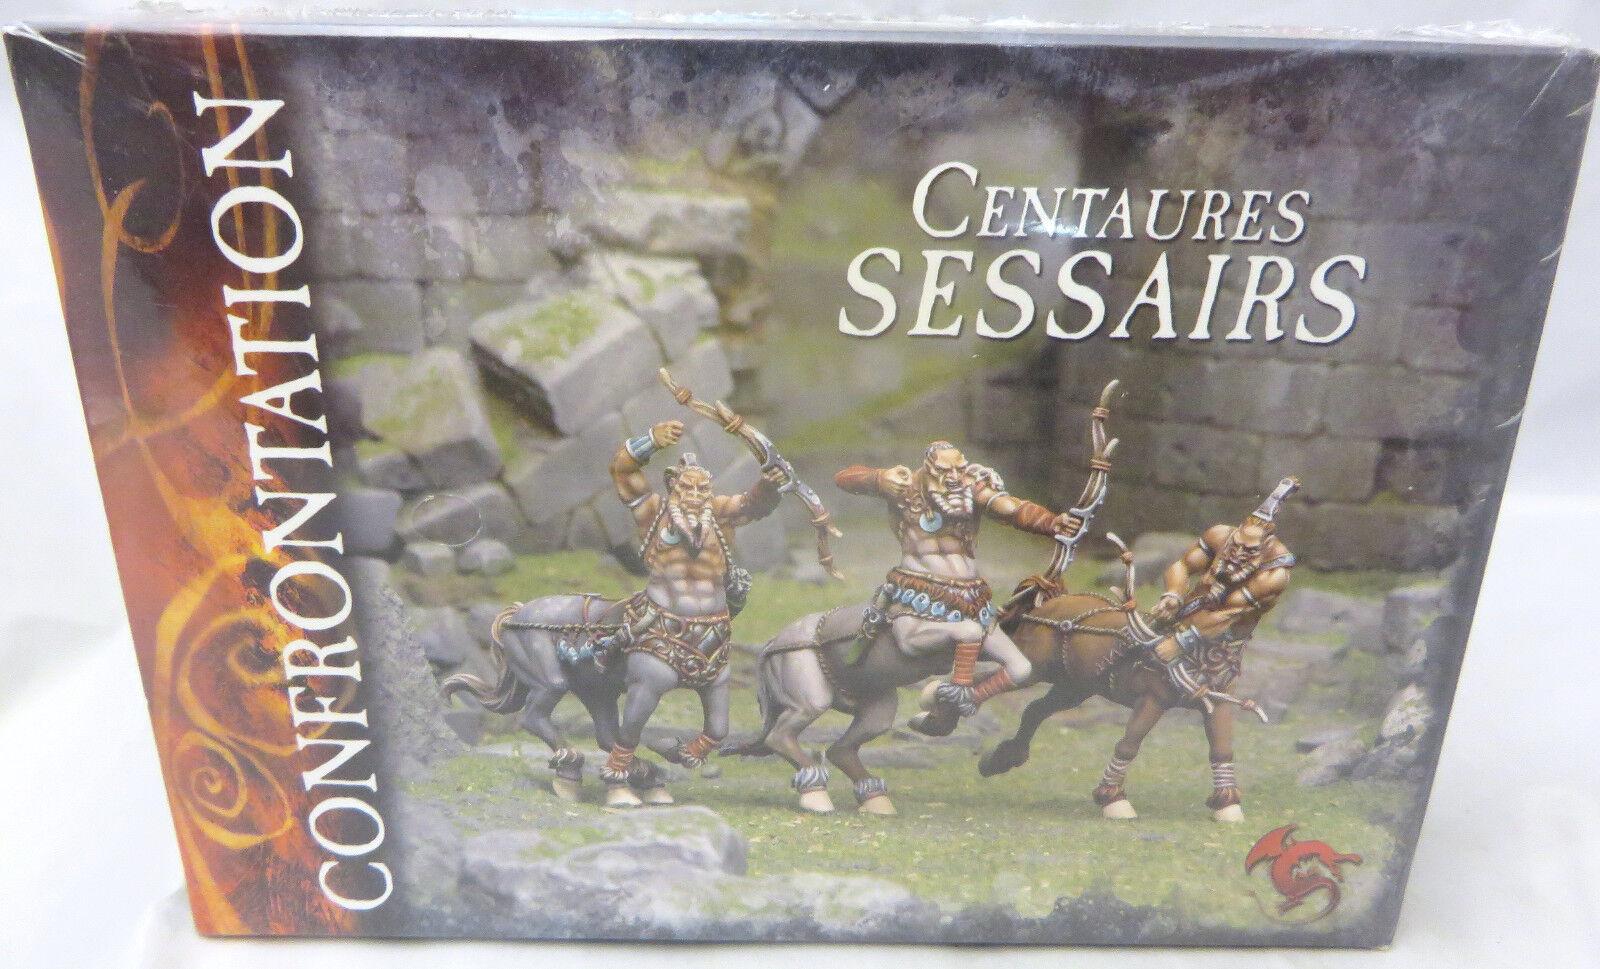 CONFRONTATION - SESSAIRS KELTS - NIB in shrink RARE centaurs oop metal